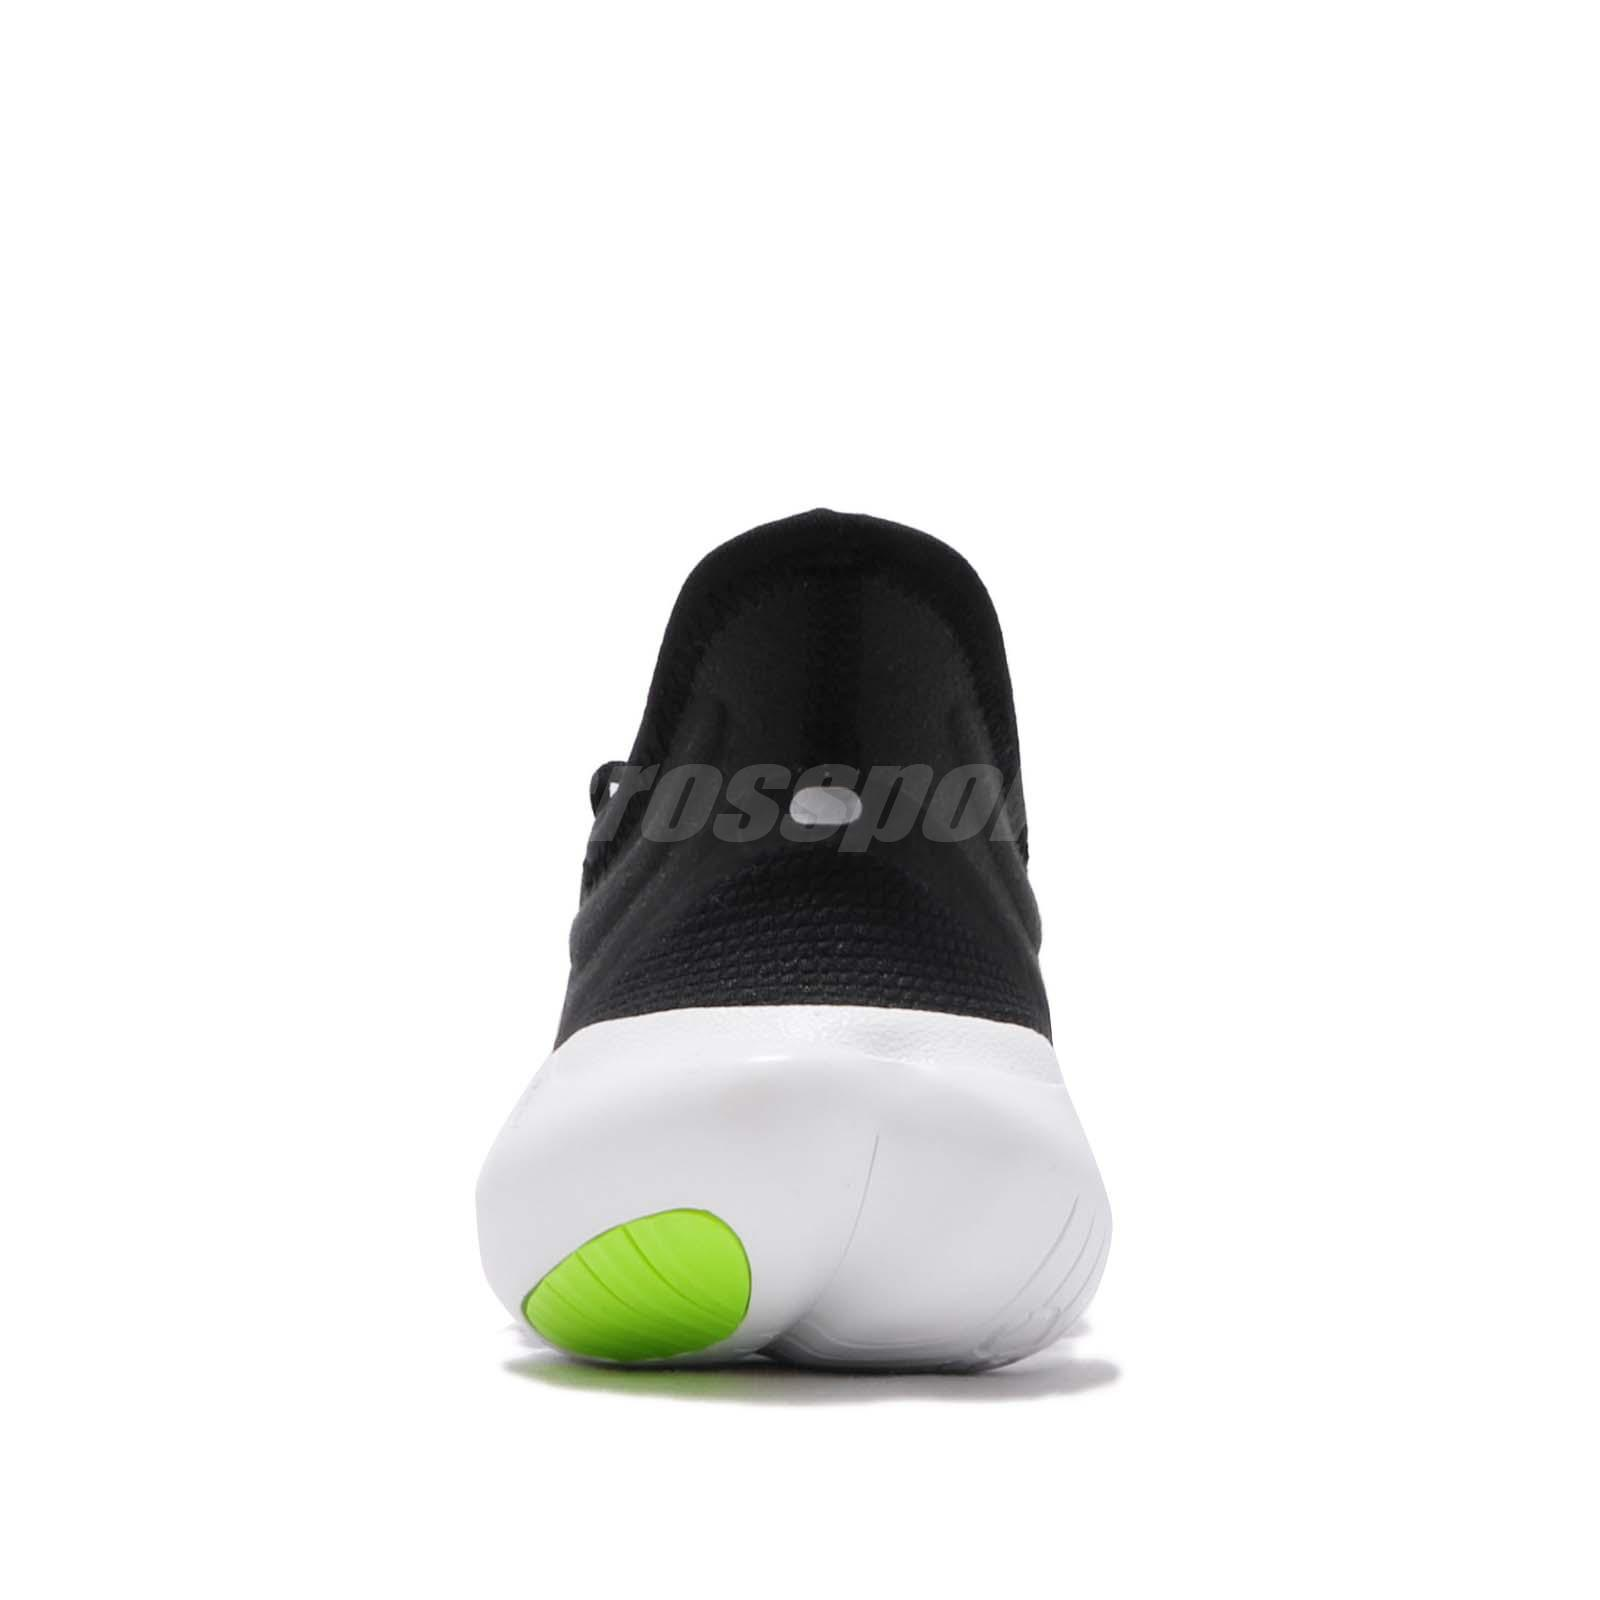 Nike Free Run 5.0 Women's White Blue Running Shoes Trainers AQ1316 101 New Gr.43 | eBay